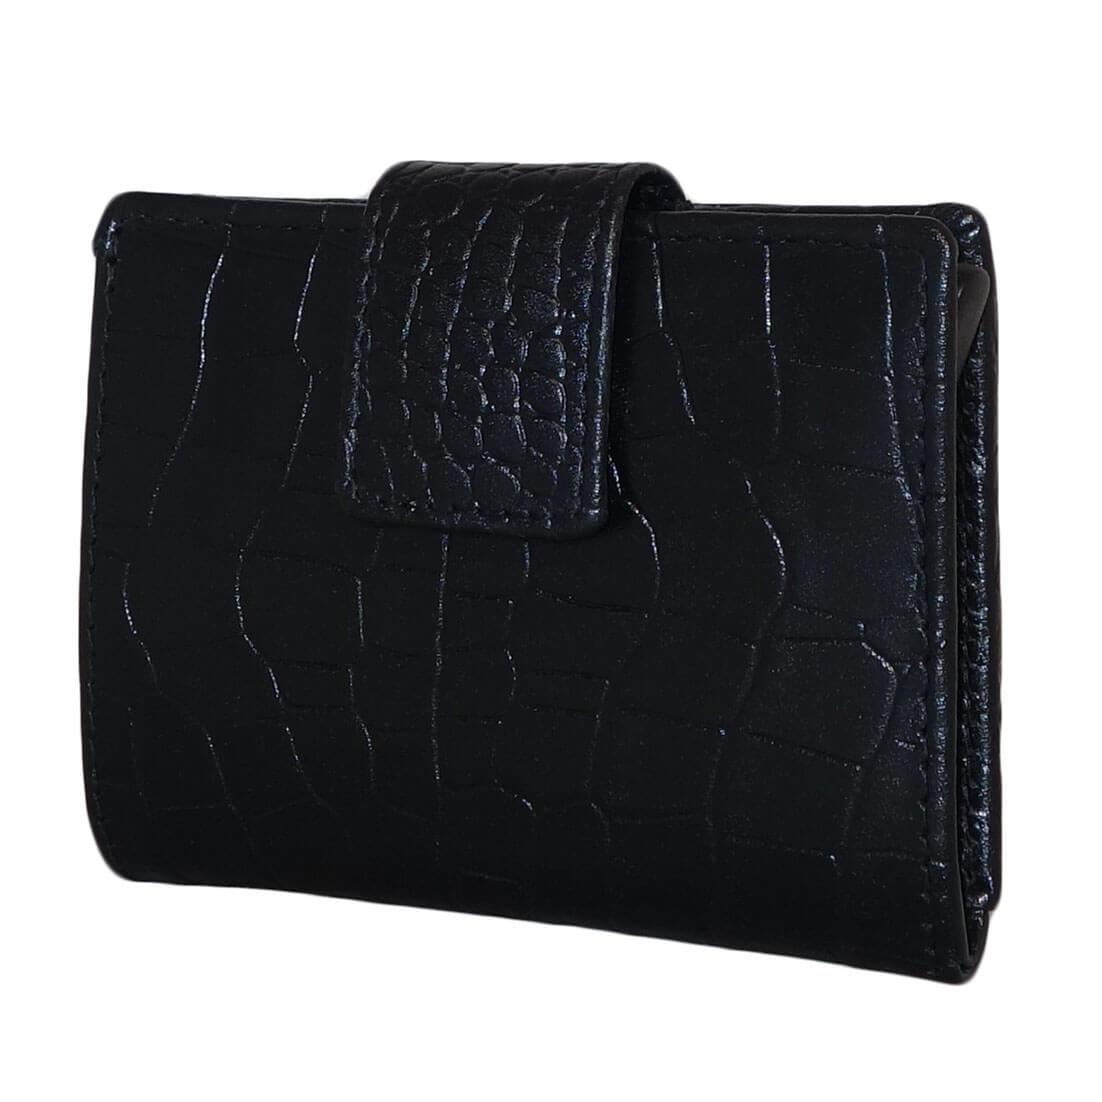 Porte-monnaie En Cuir Design Croco Noir Avec Porte-boîte xmrJJ0dA